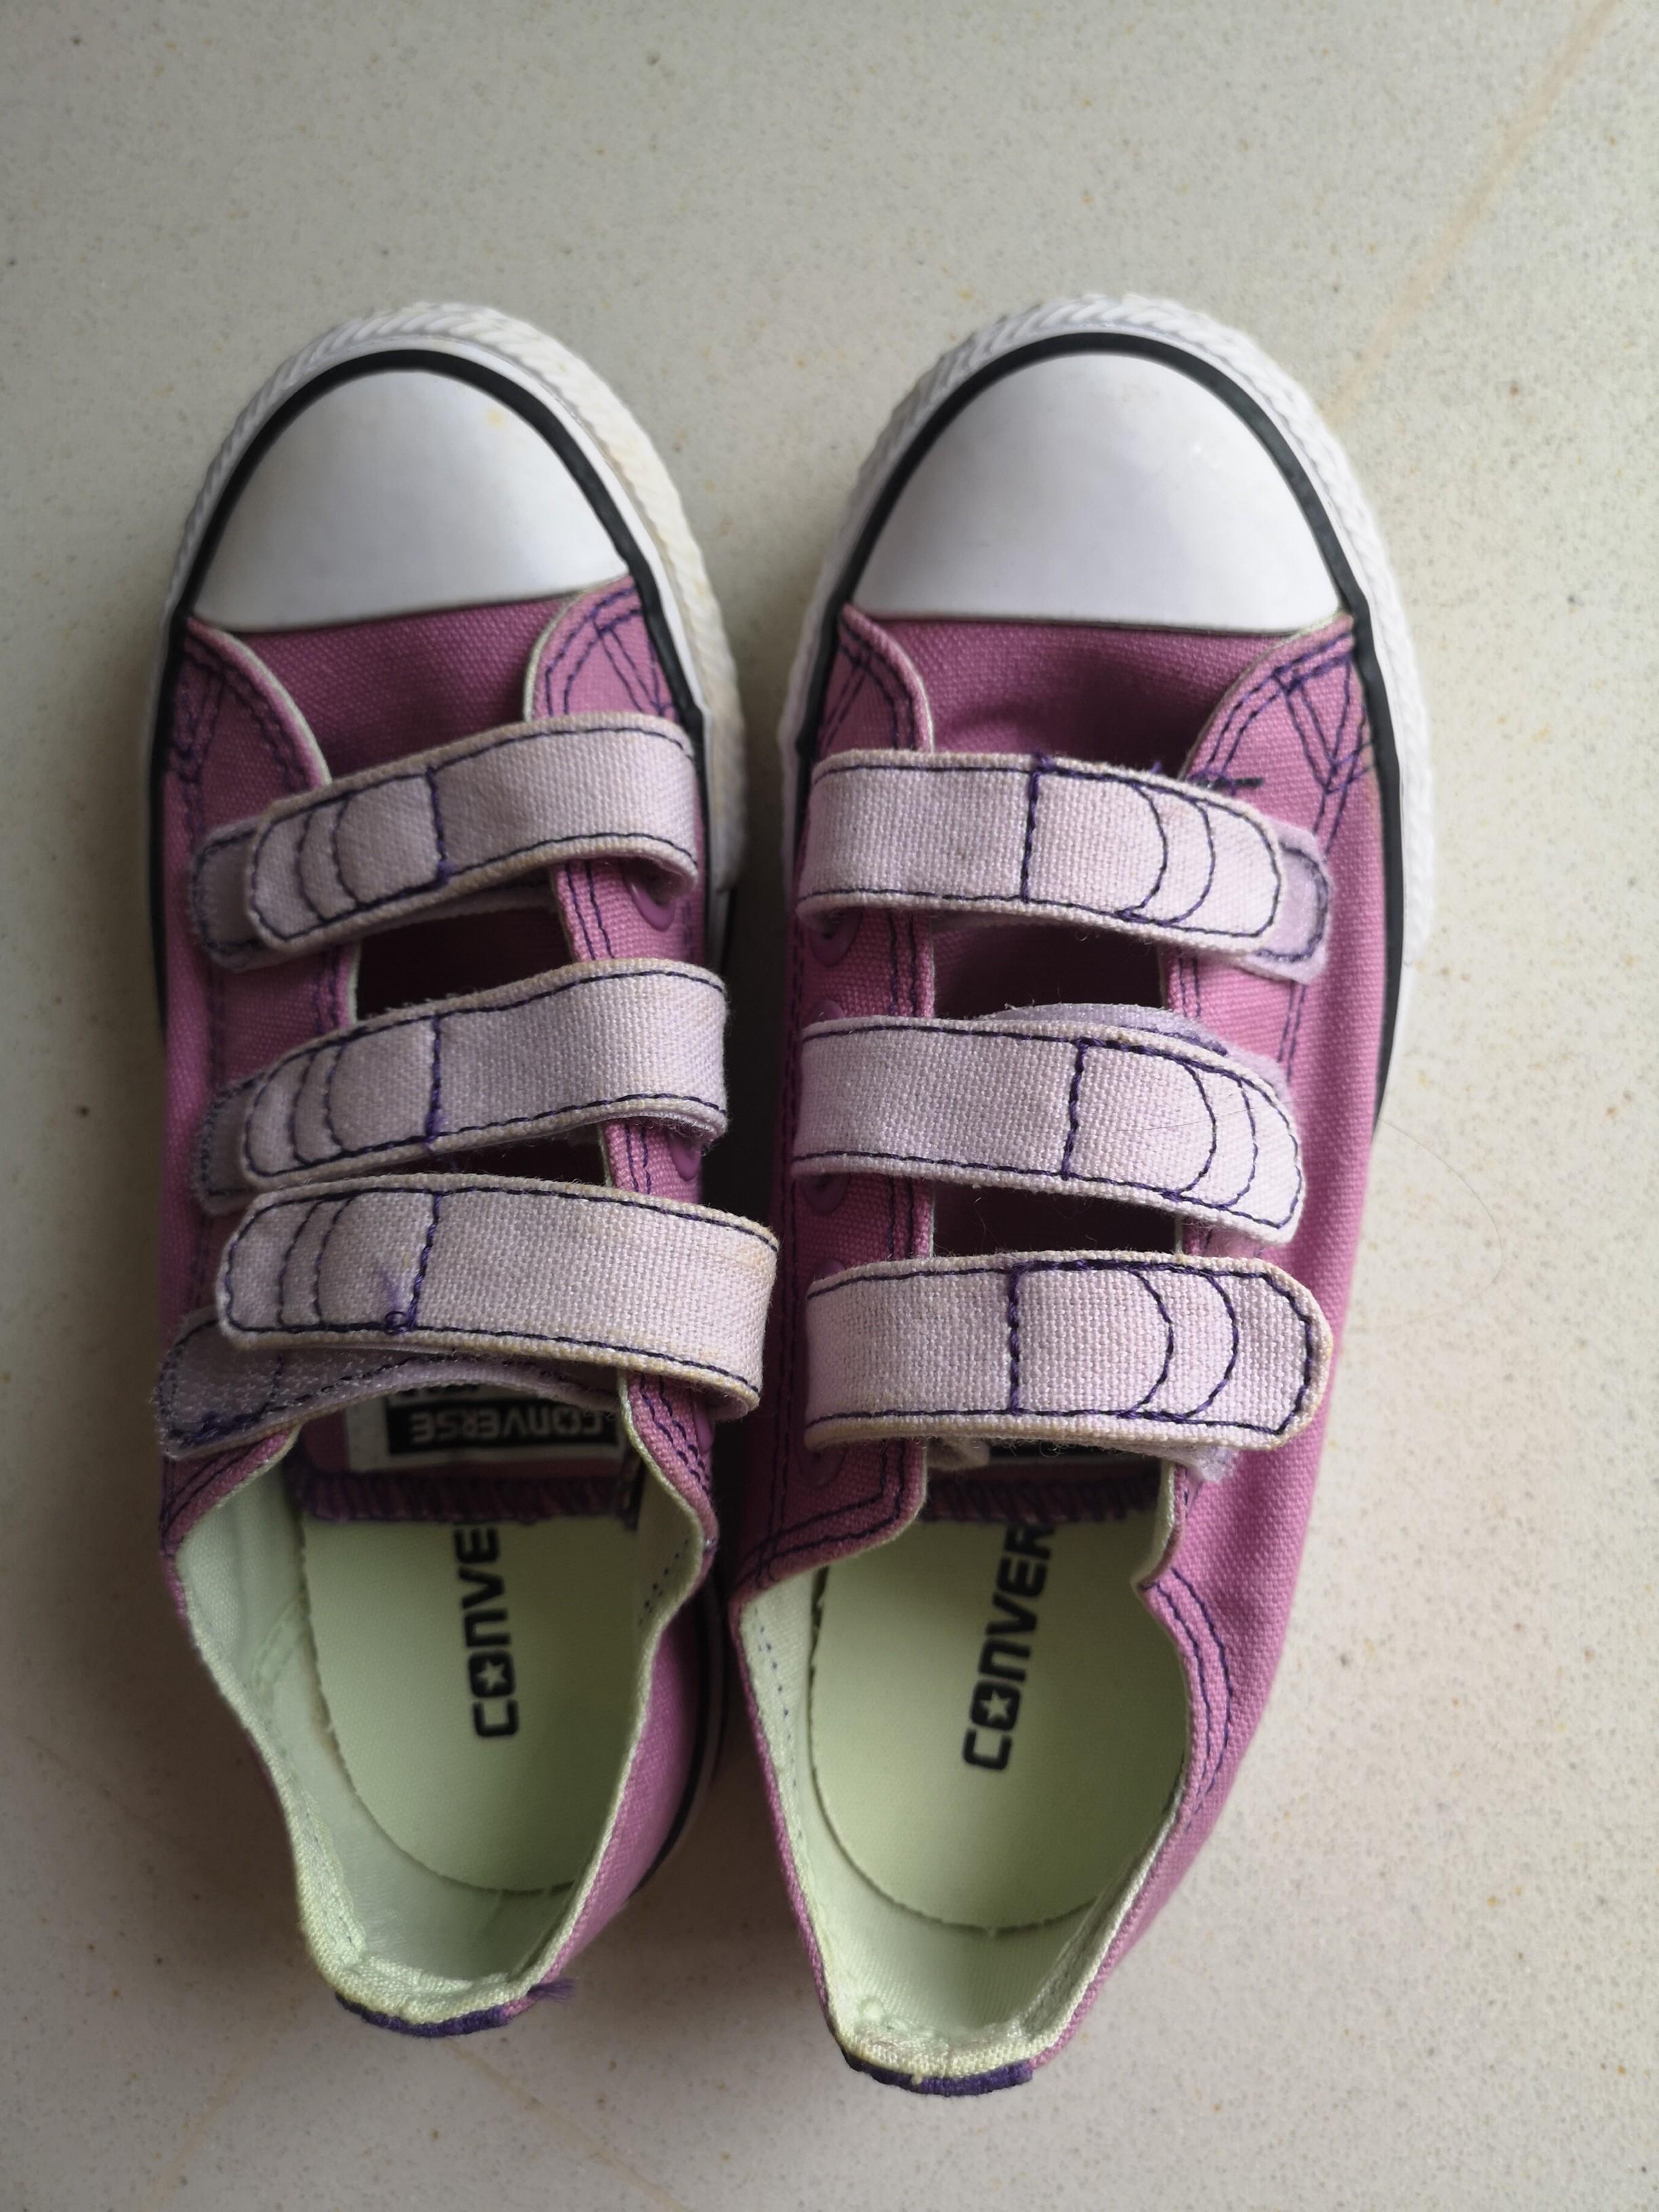 Converse kids size 12, Babies \u0026 Kids